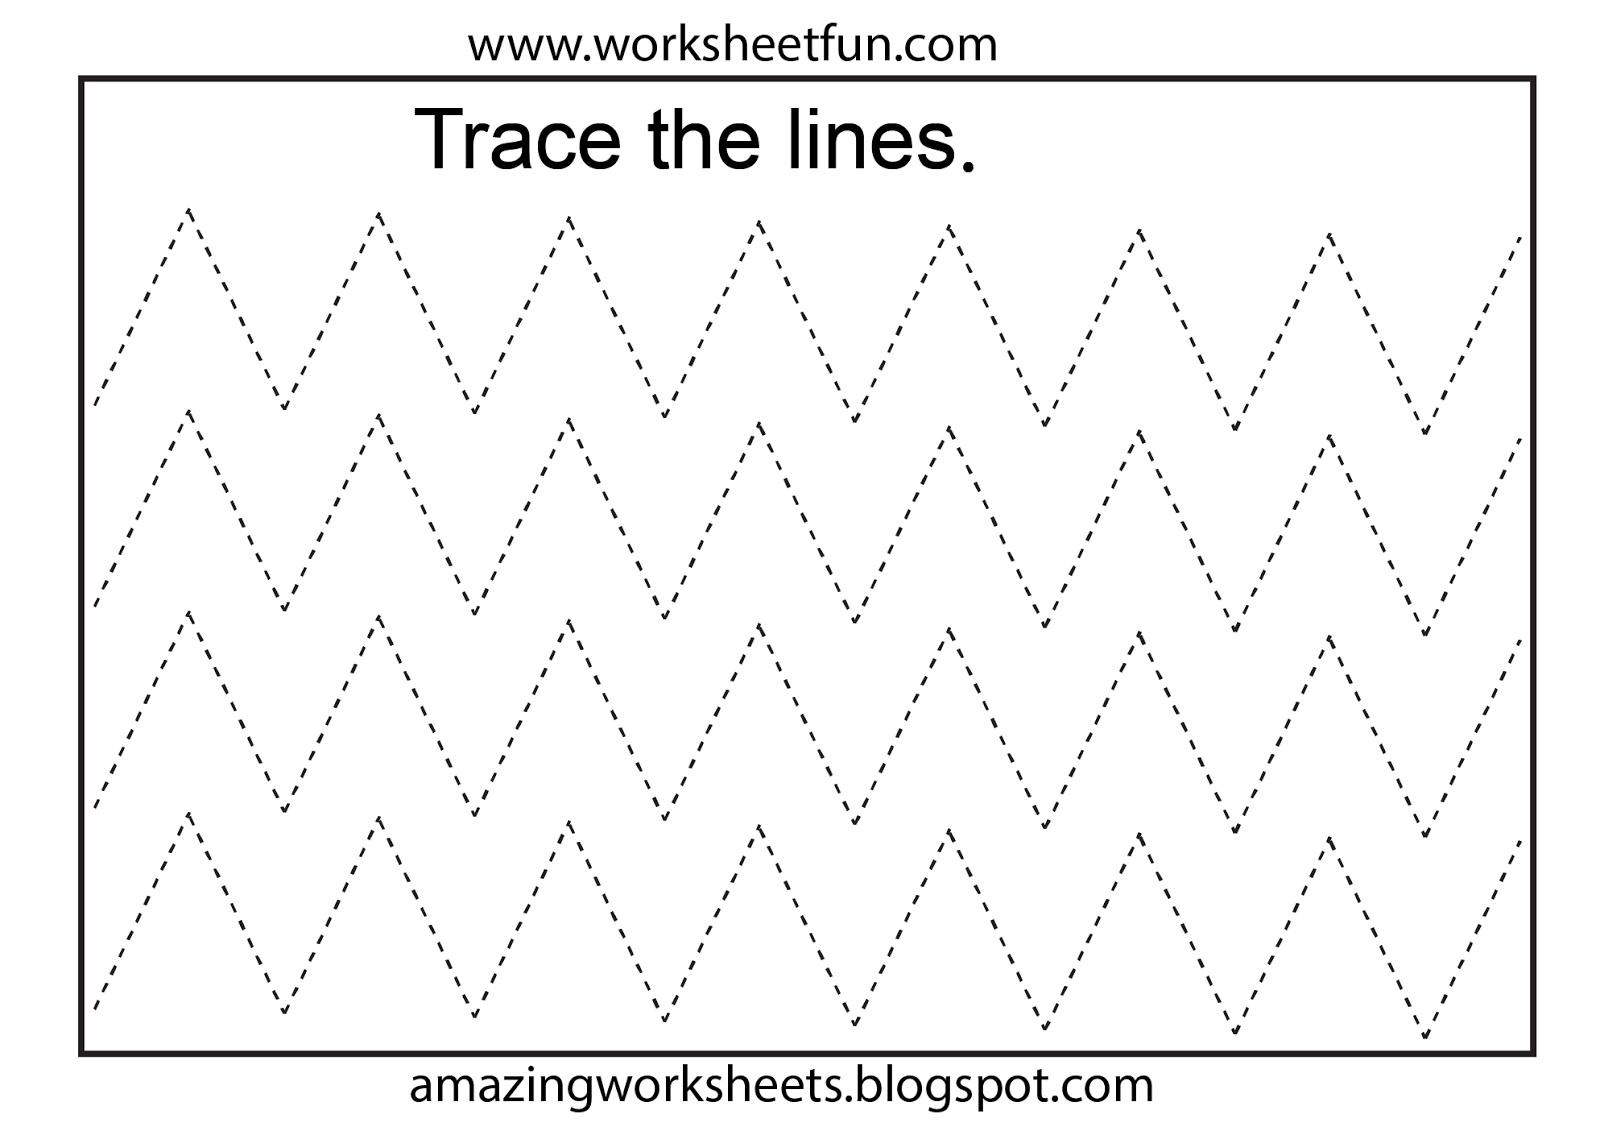 Free Printable Tracing Worksheets Preschool   Preschool Worksheets - Free Printable Preschool Worksheets Tracing Lines